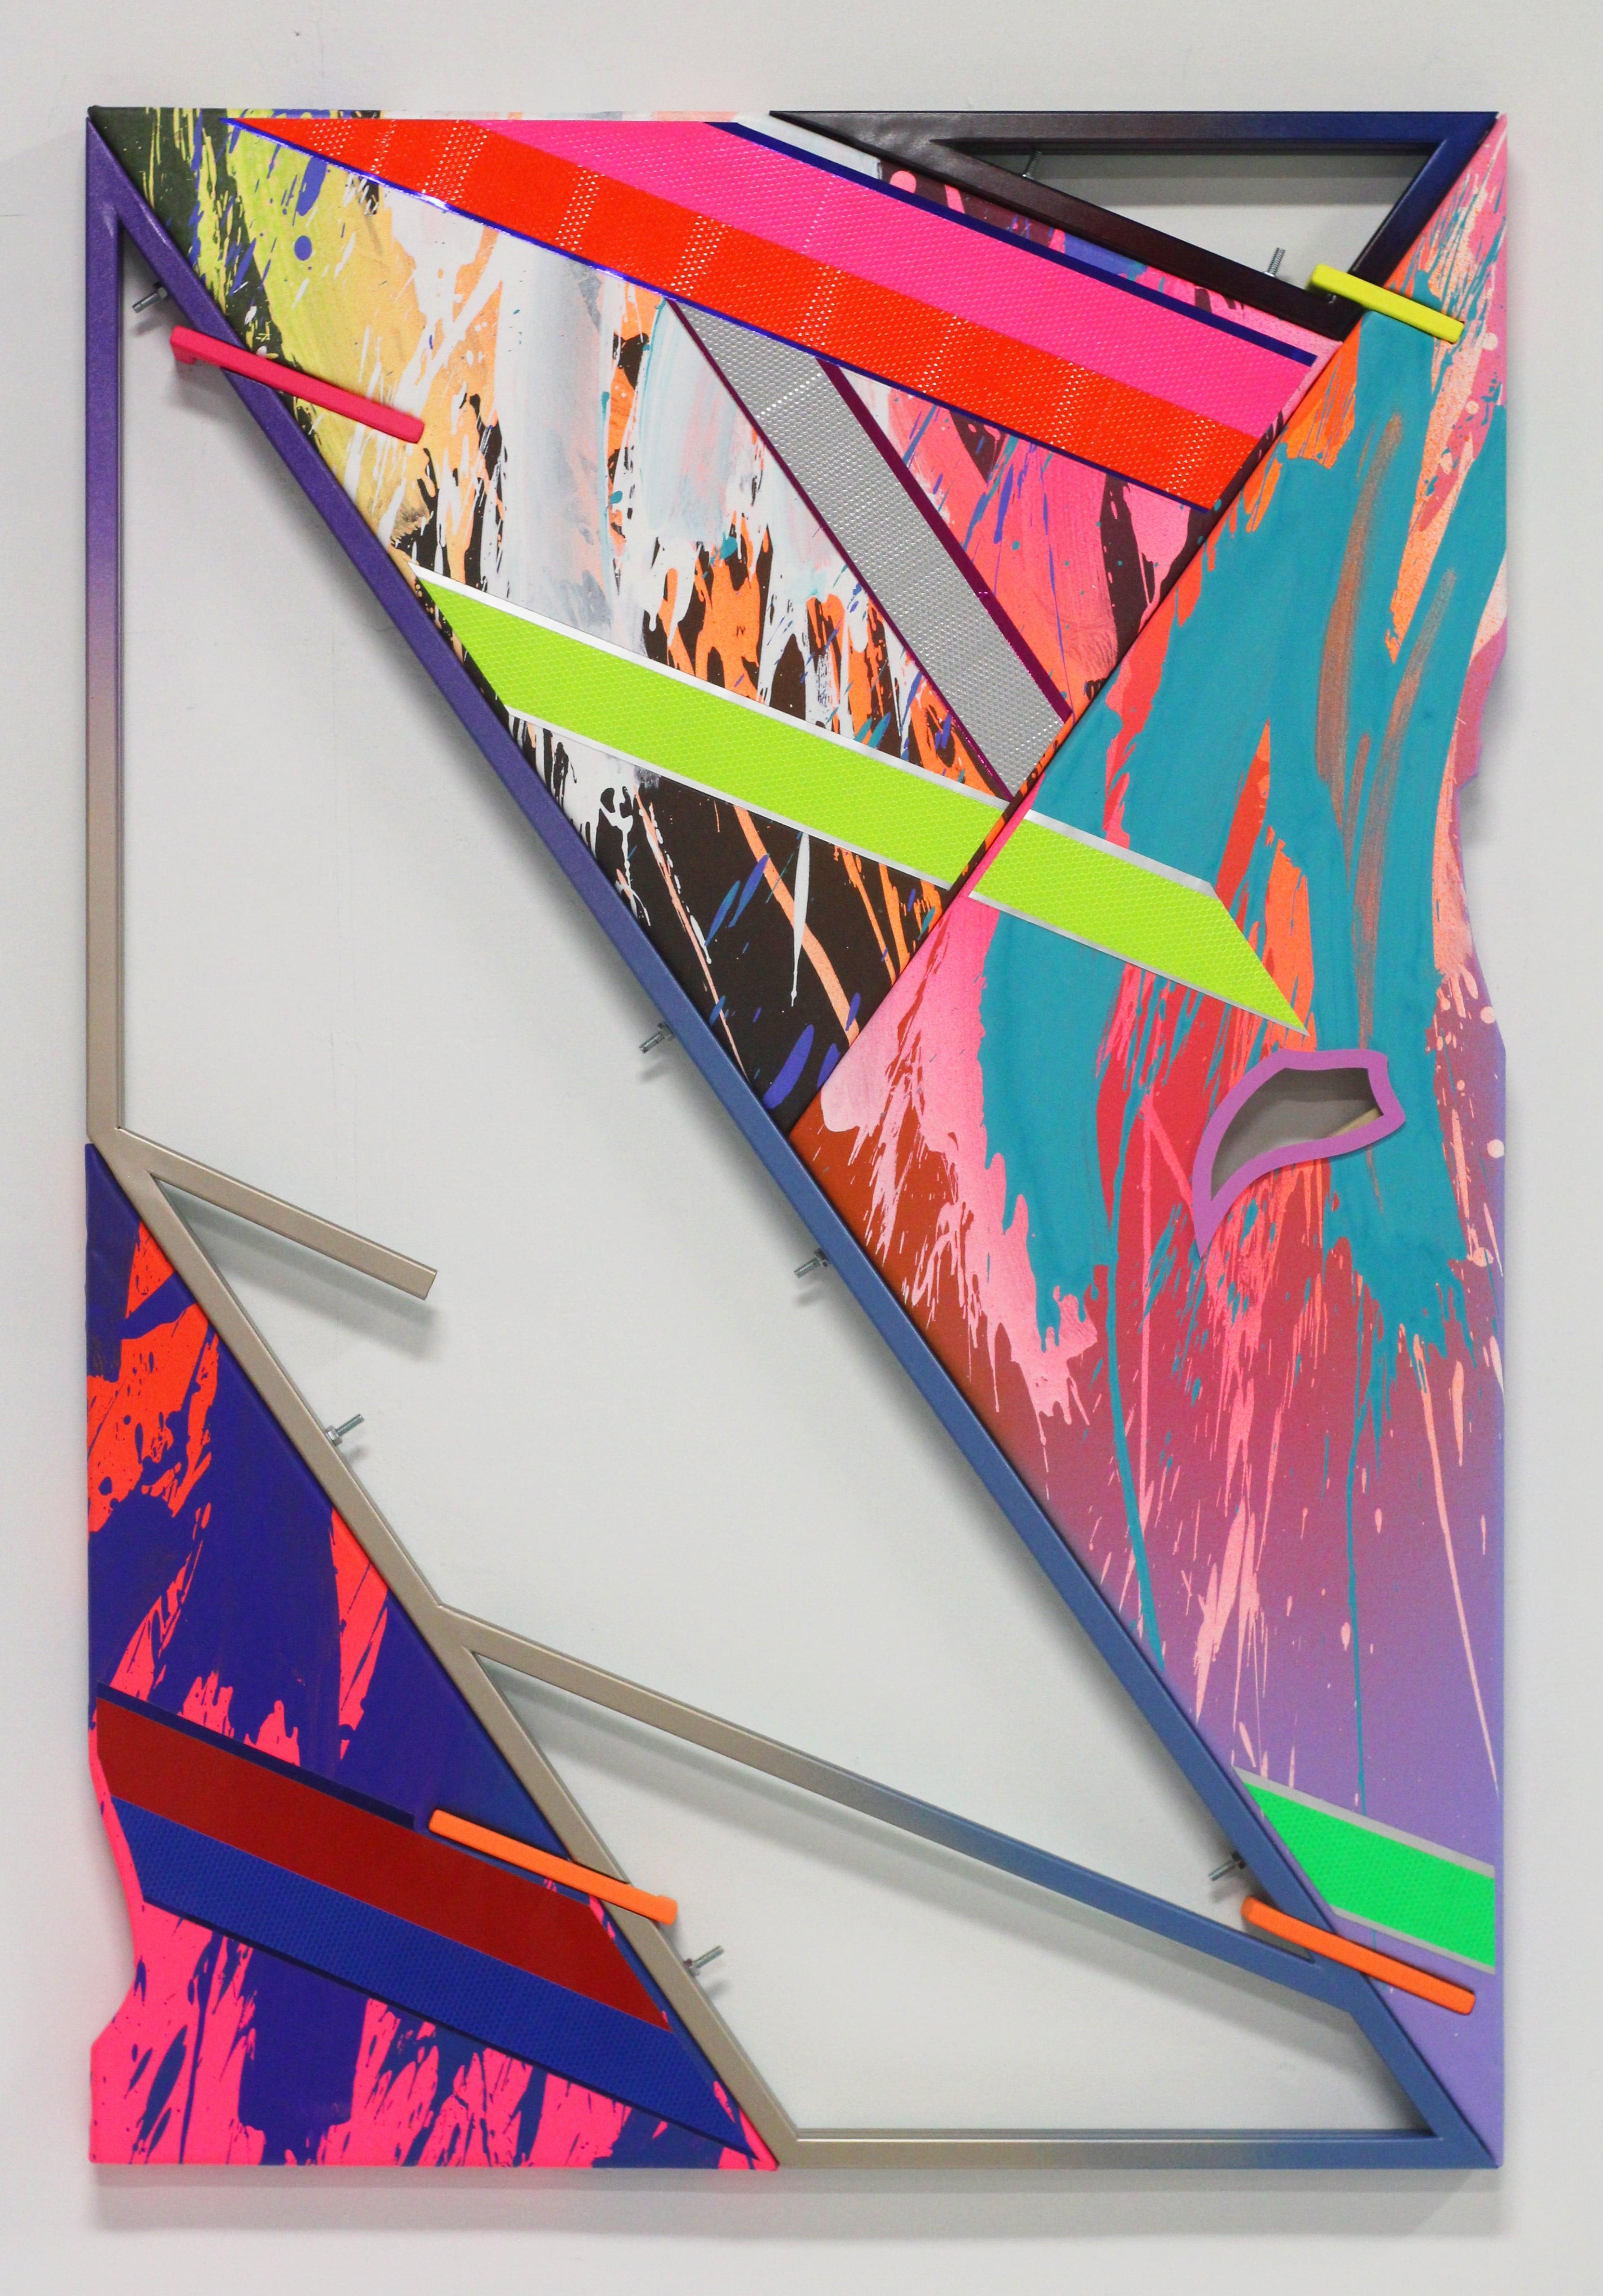 NemesM_New-Tomorrow-22_2019_715x515cm_acrylic-mirror-board-light-reflective-vinyl-lasercut-plexiglass-PVC-foam-board-carpaint-steel-canvas-wood-min